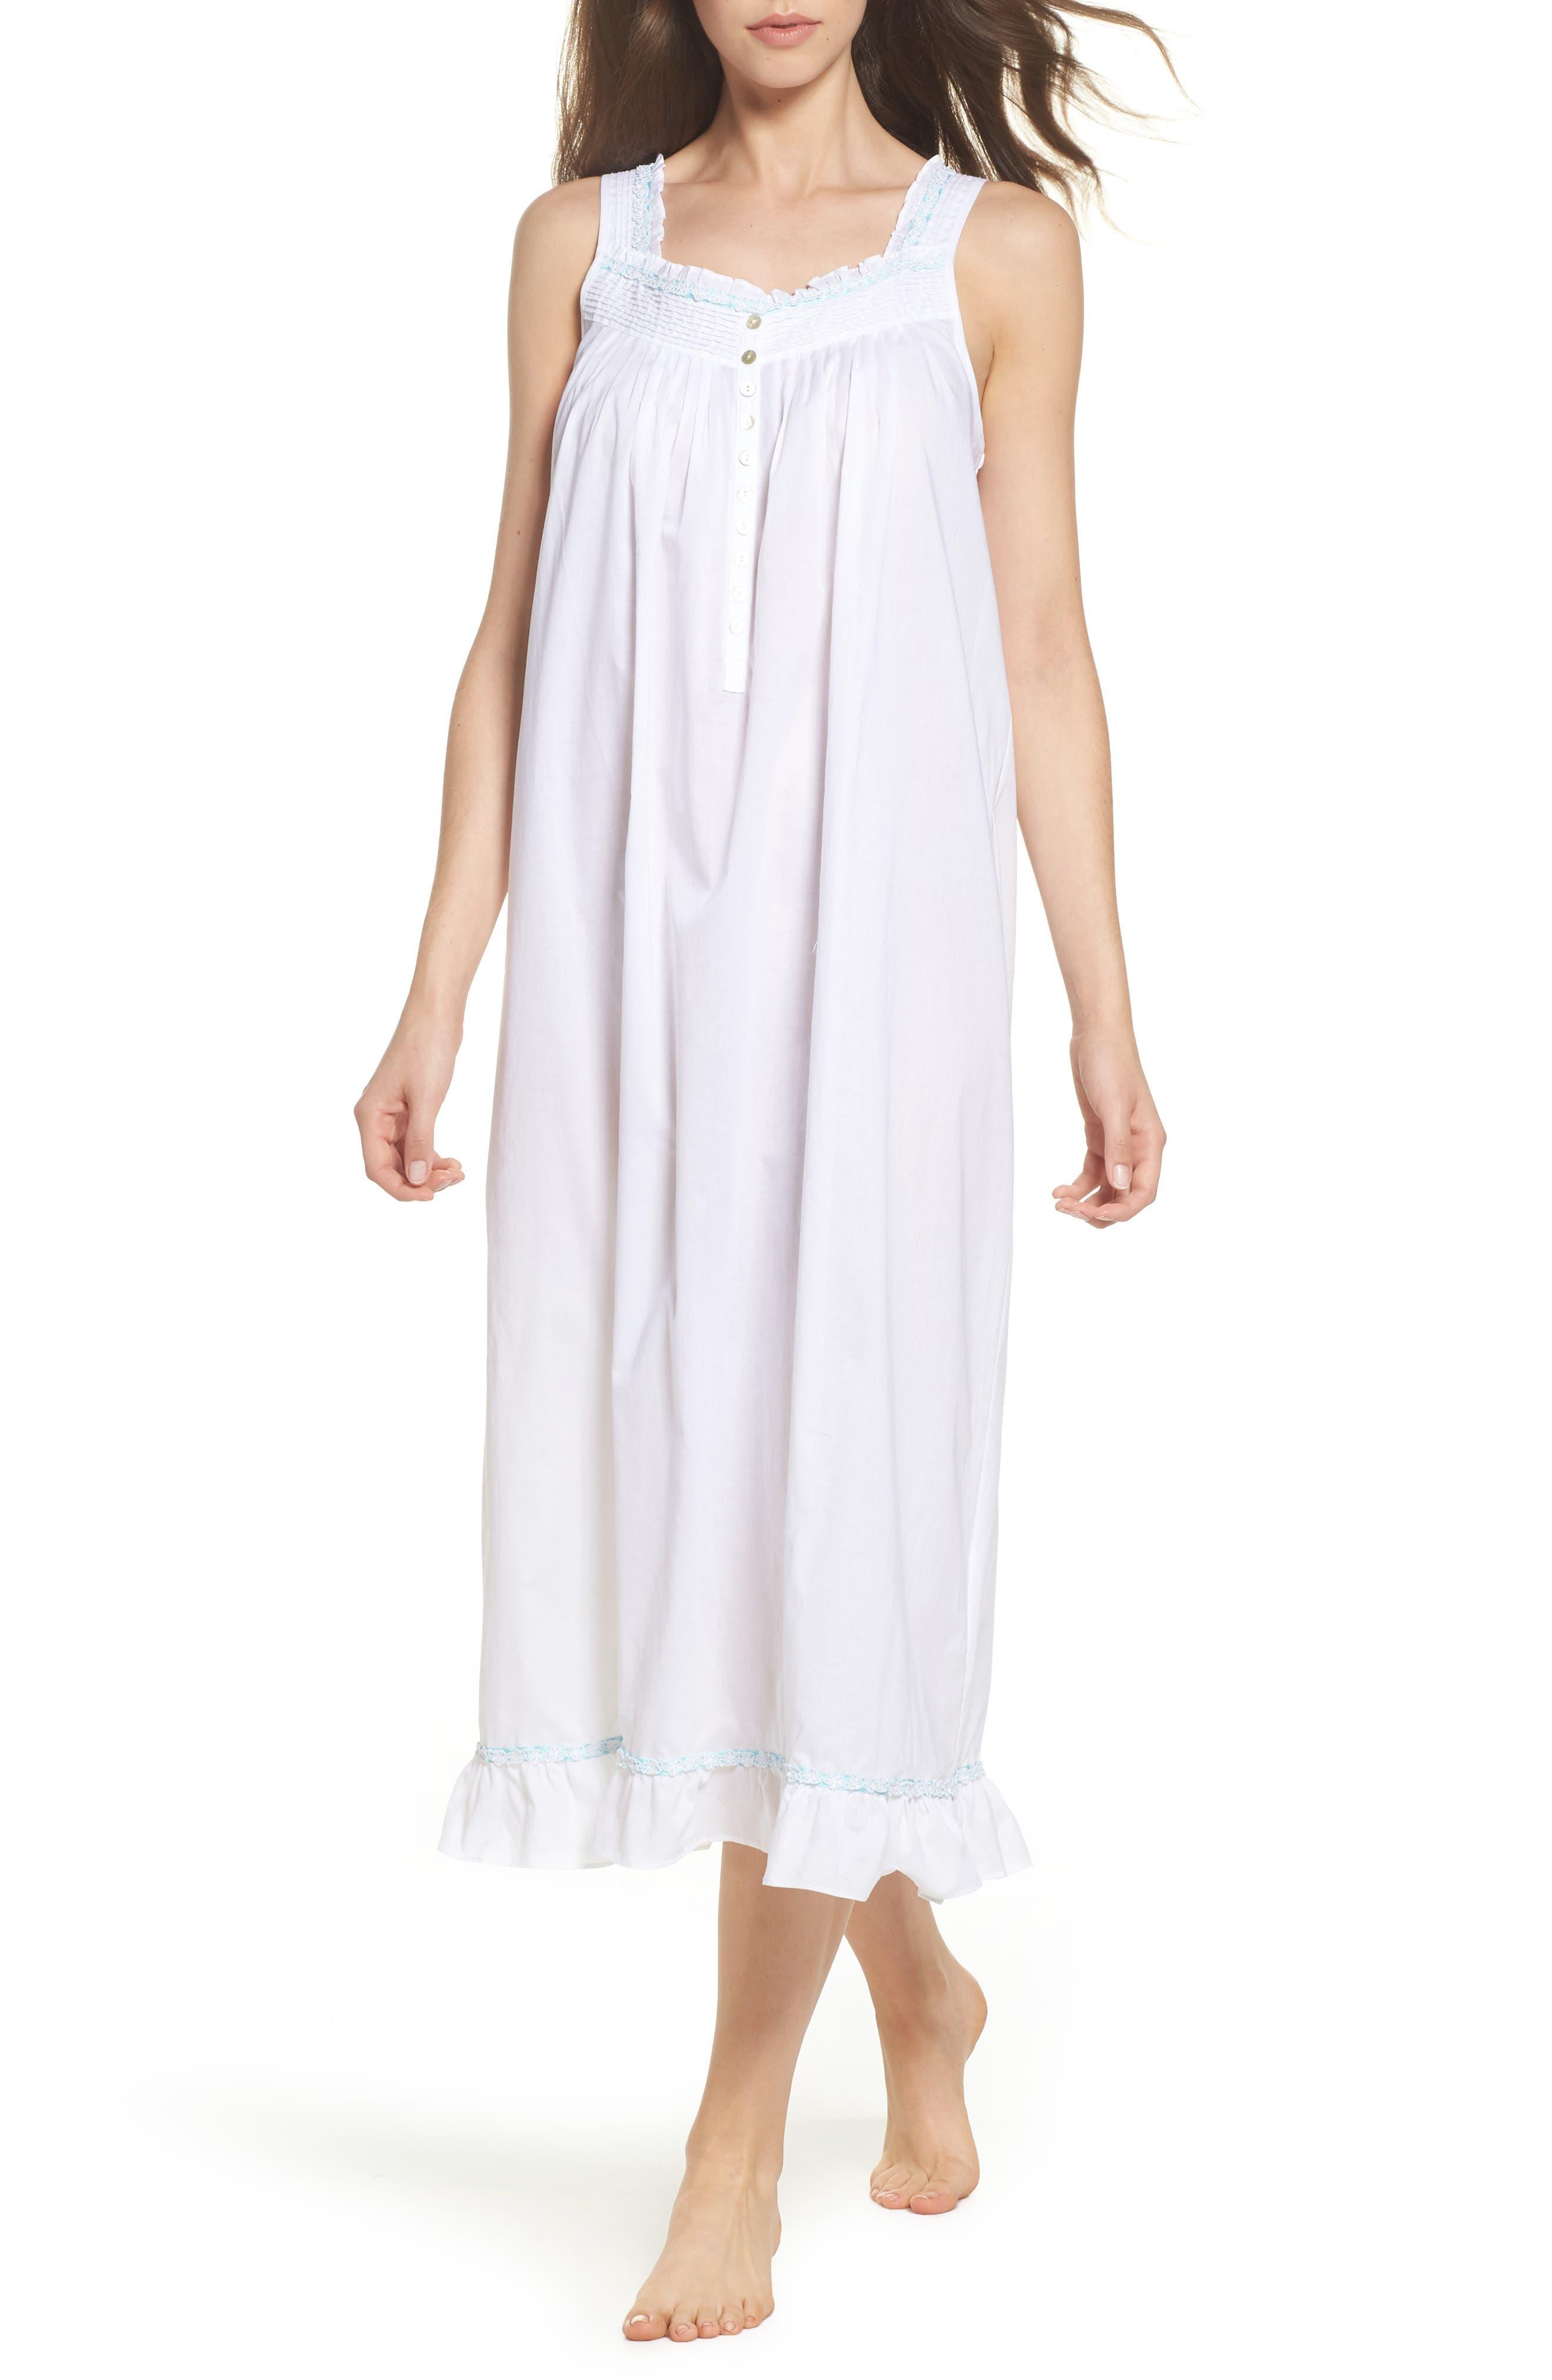 Cotton Lawn Ballet Nightgown,                         Main,                         color, 100